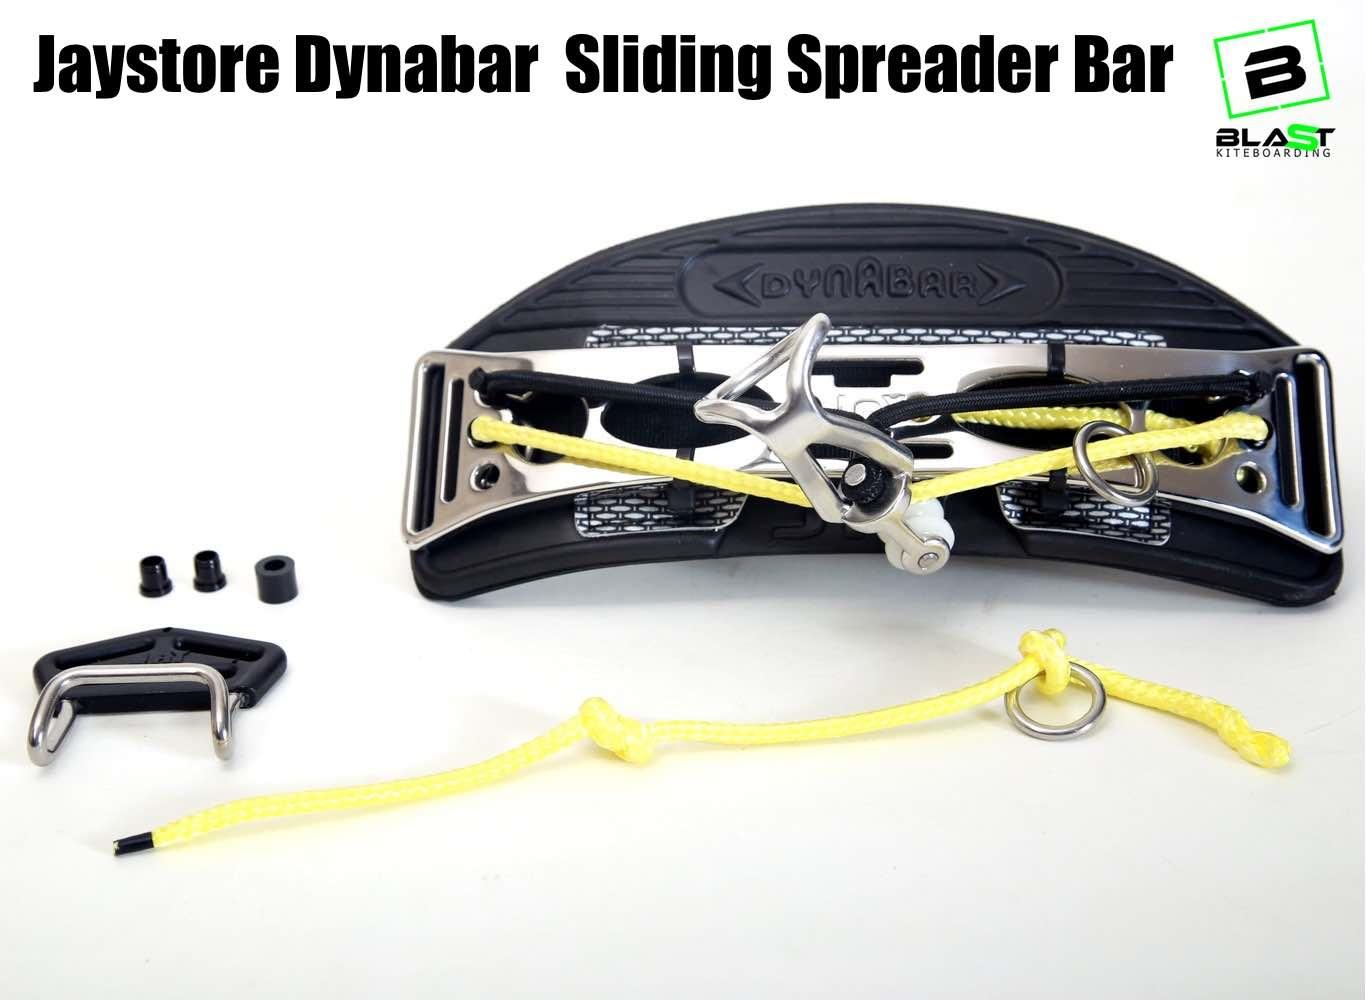 Jay Dynabar Spreader Bar